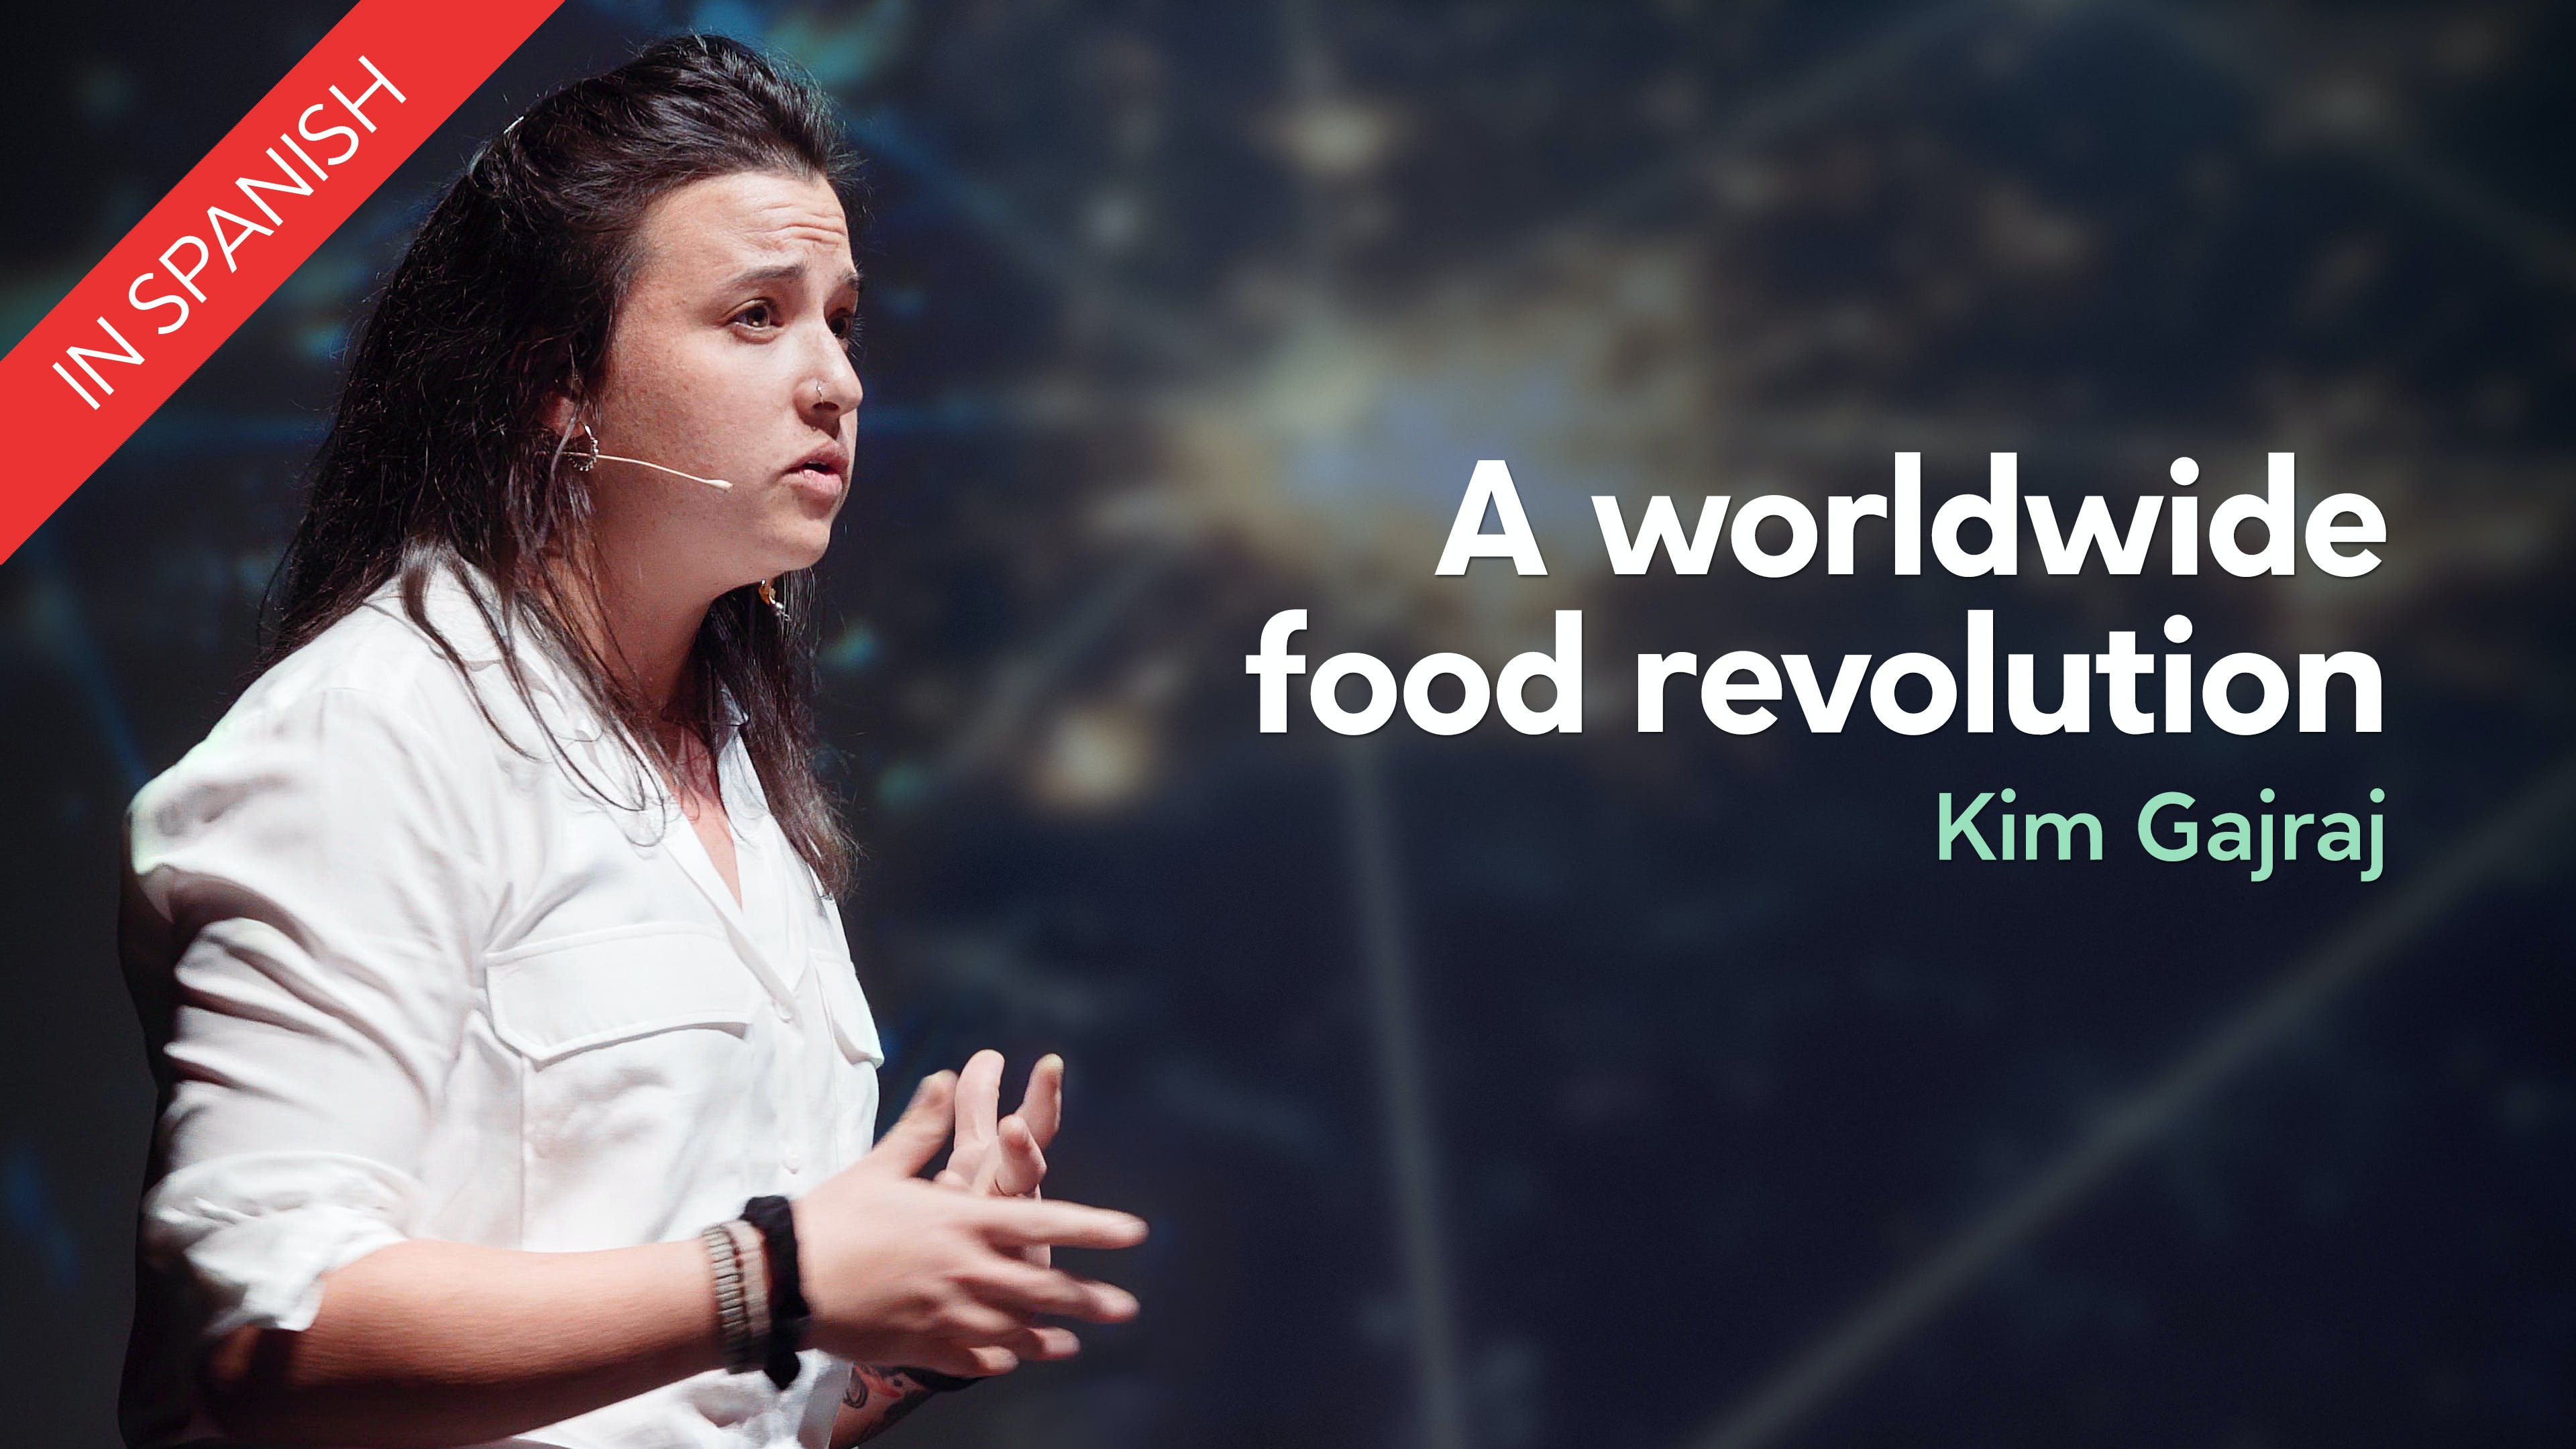 A worldwide food revolution – Kim Gajraj